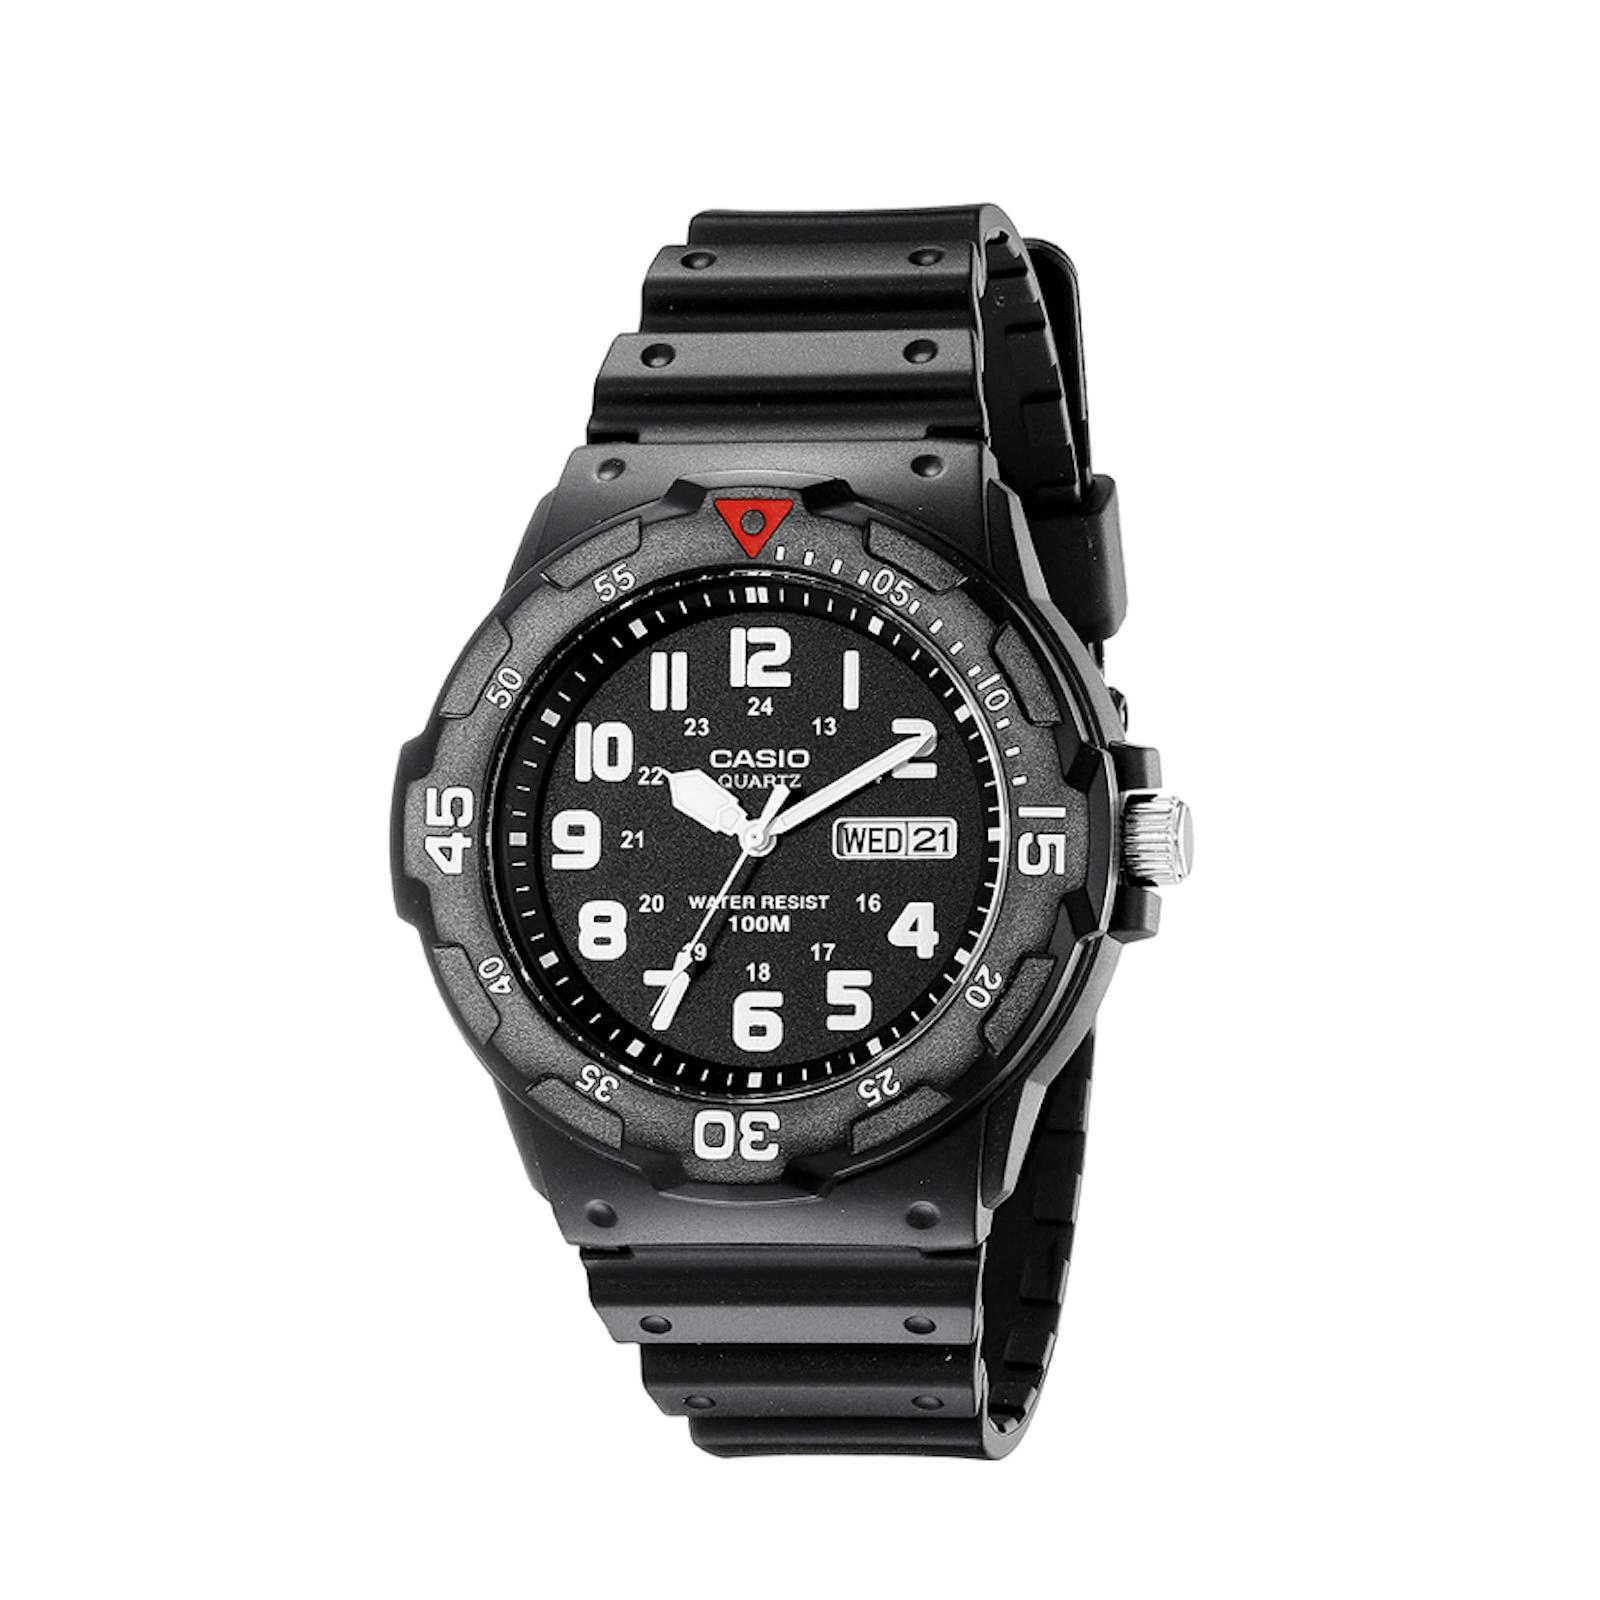 Casio MRW200H-1B Watch Diver Black MRW200